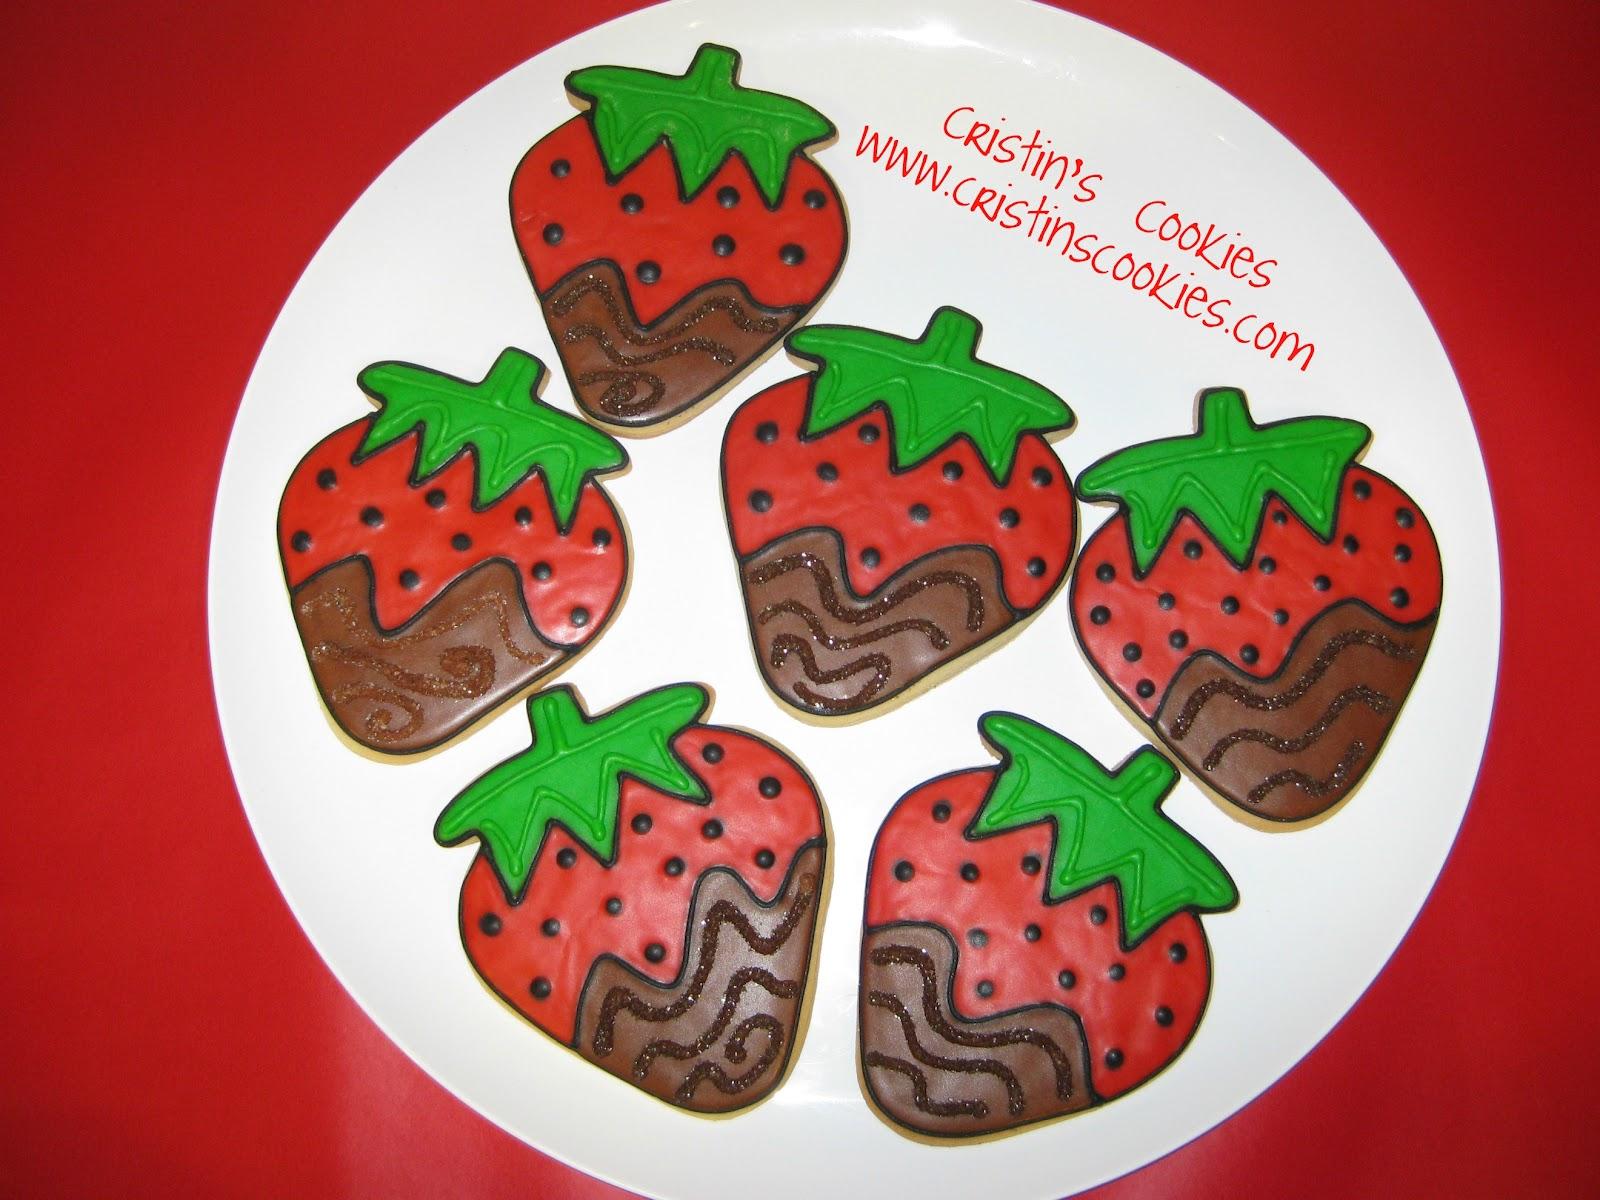 Cartoon Chocolate Covered Strawberry Chocolate covered strawberriesCartoon Chocolate Covered Strawberry